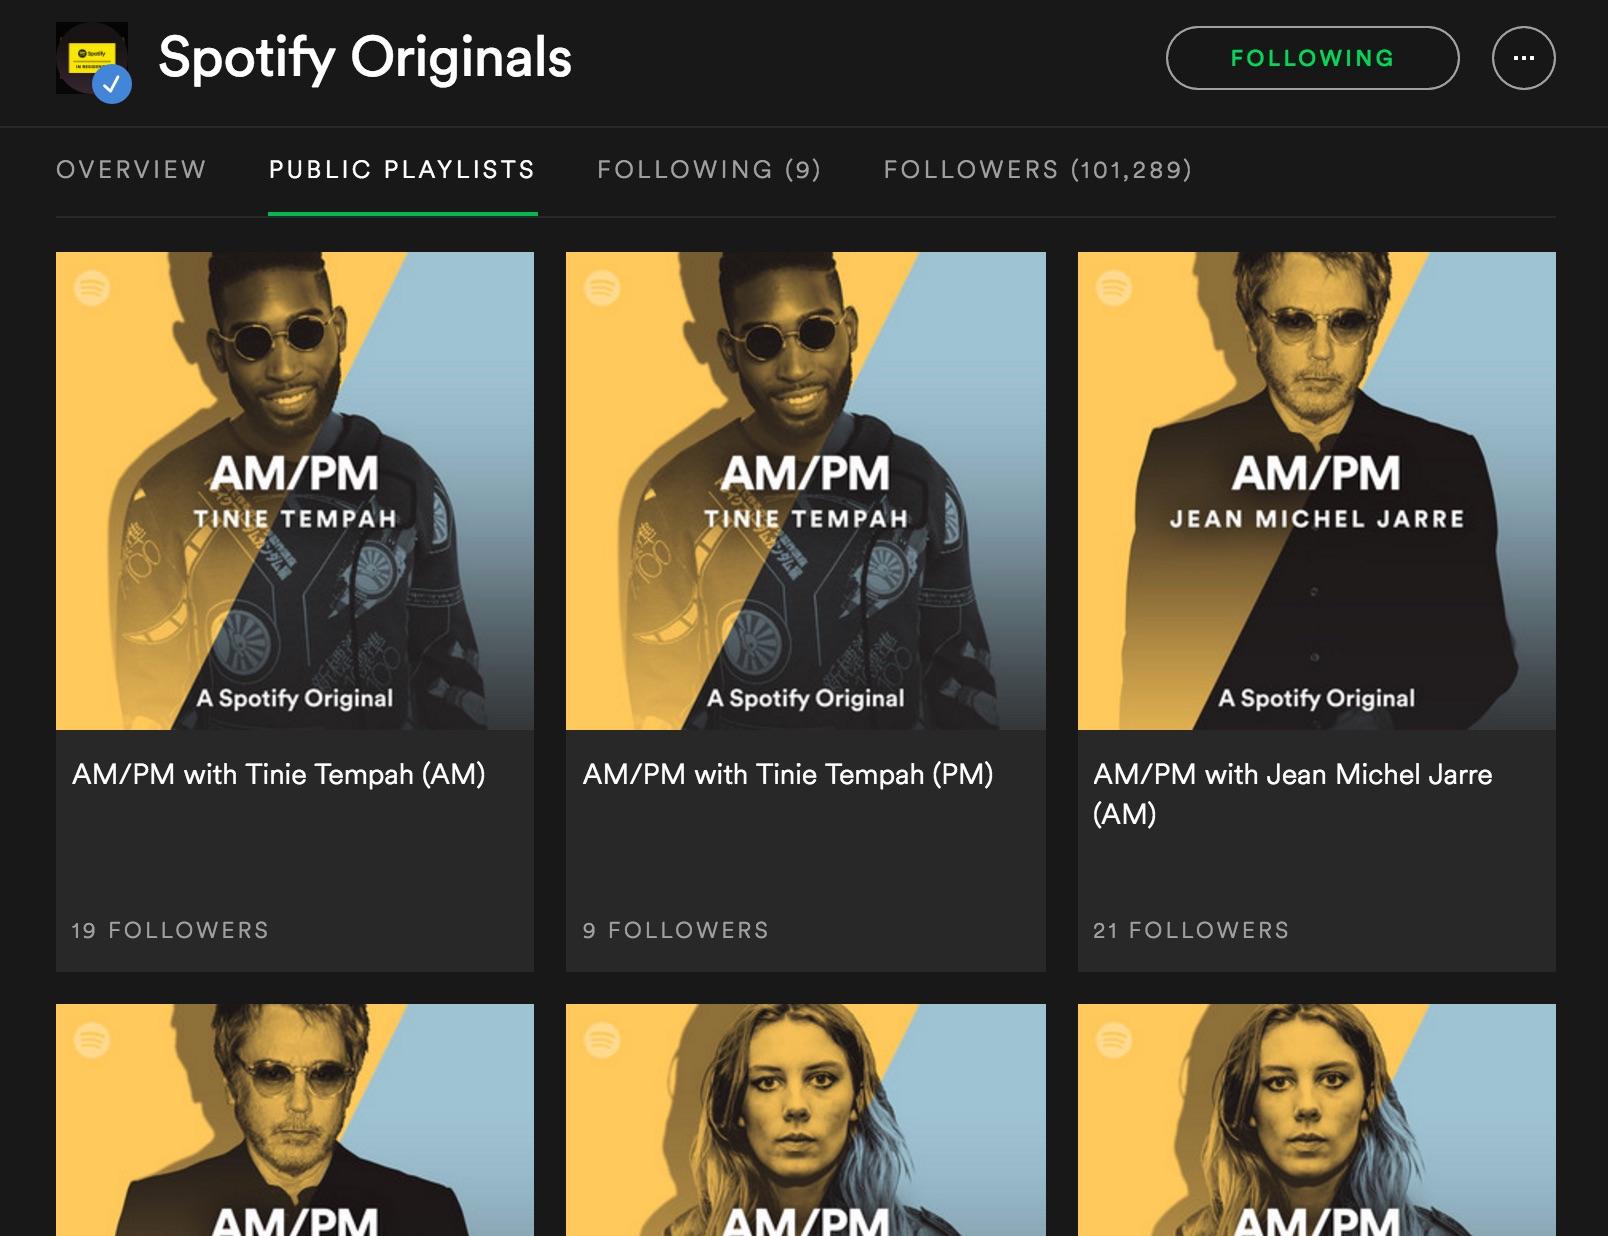 spotify-originals-am-pm.jpg